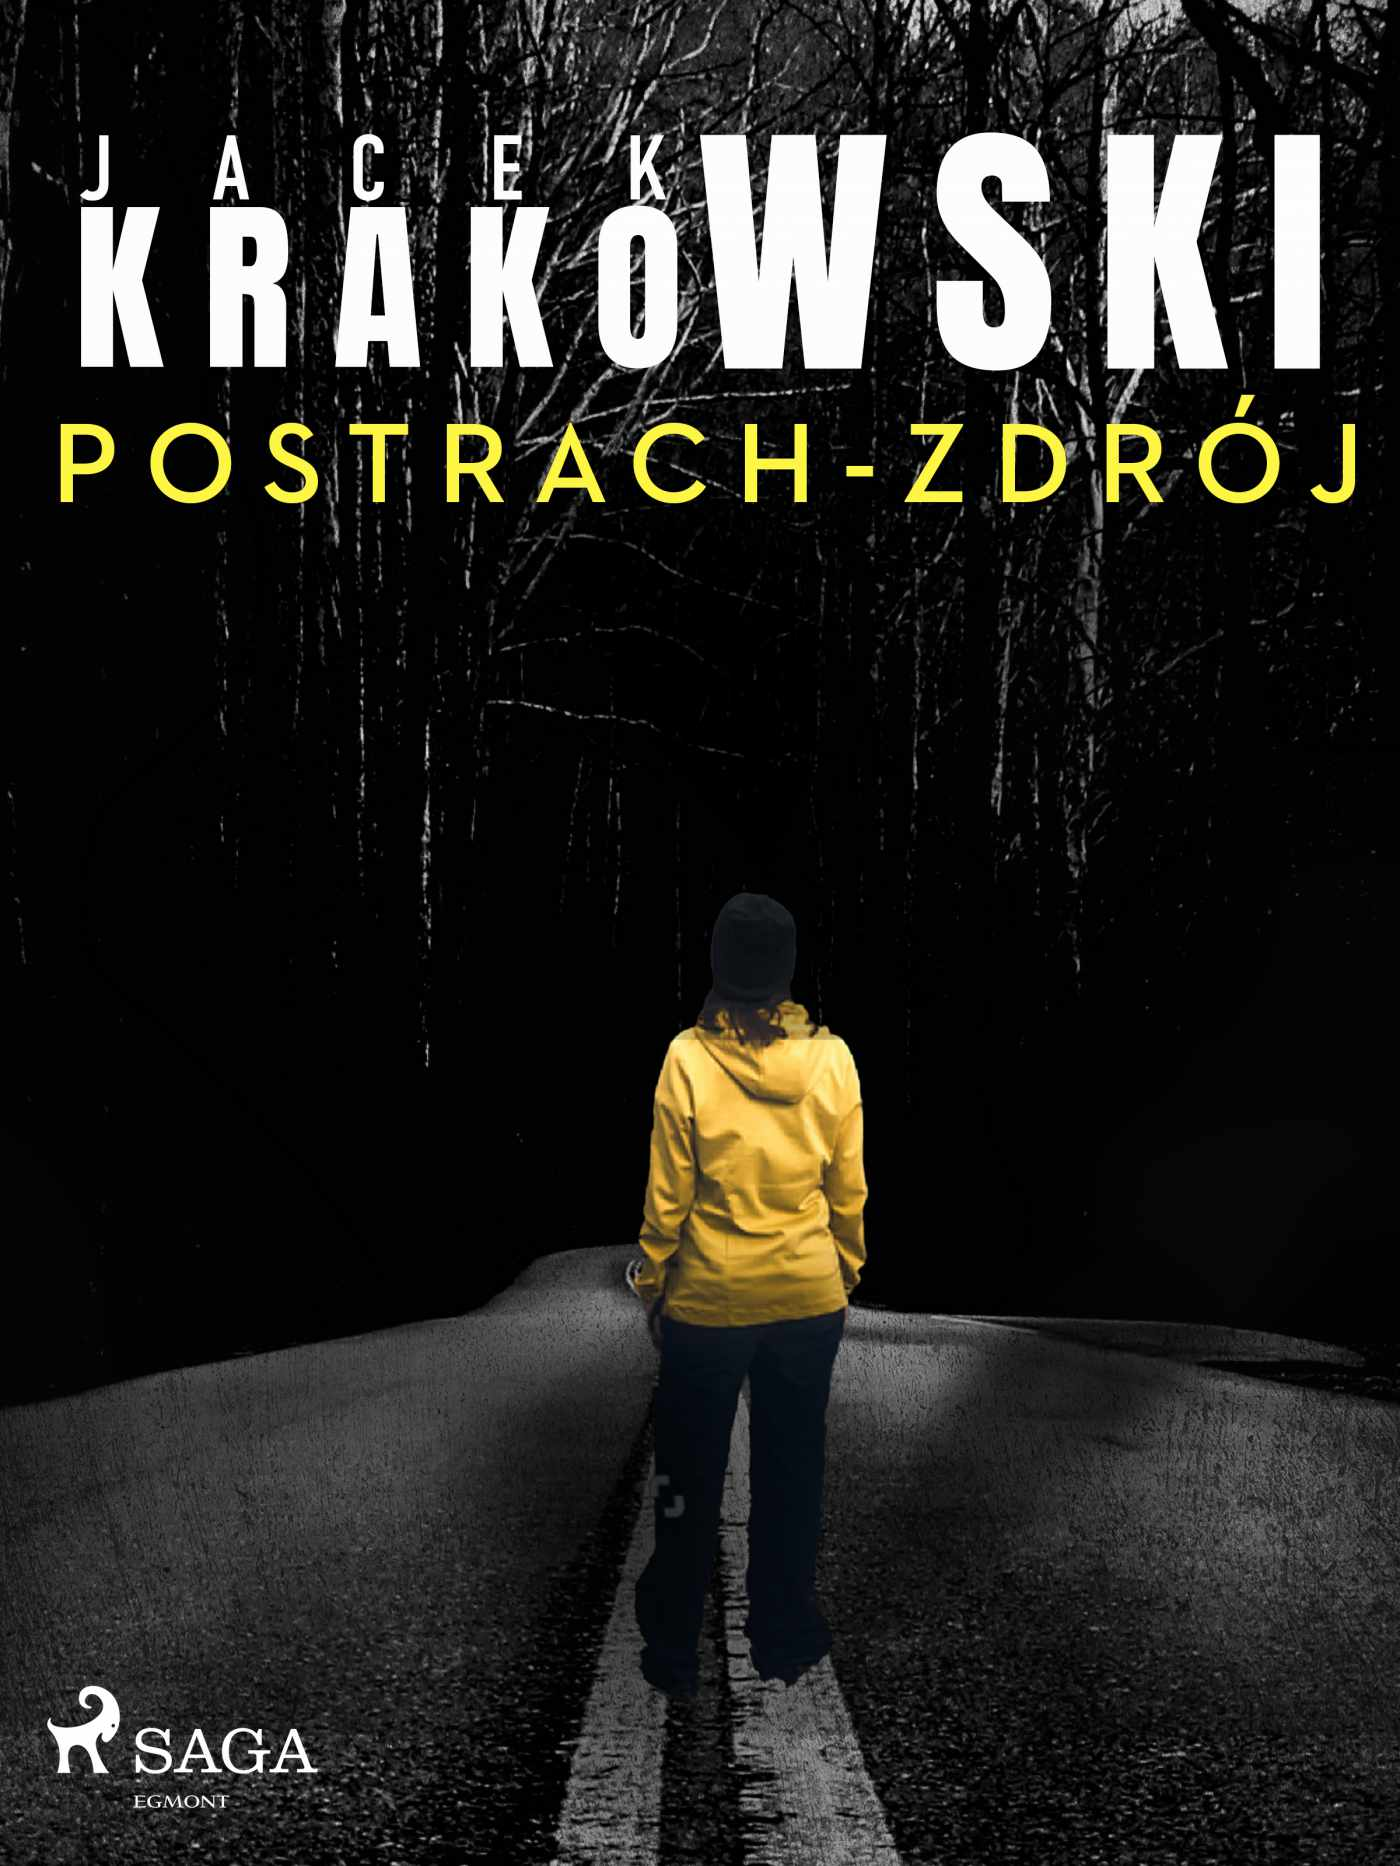 Postrach-Zdrój - Ebook (Książka EPUB) do pobrania w formacie EPUB